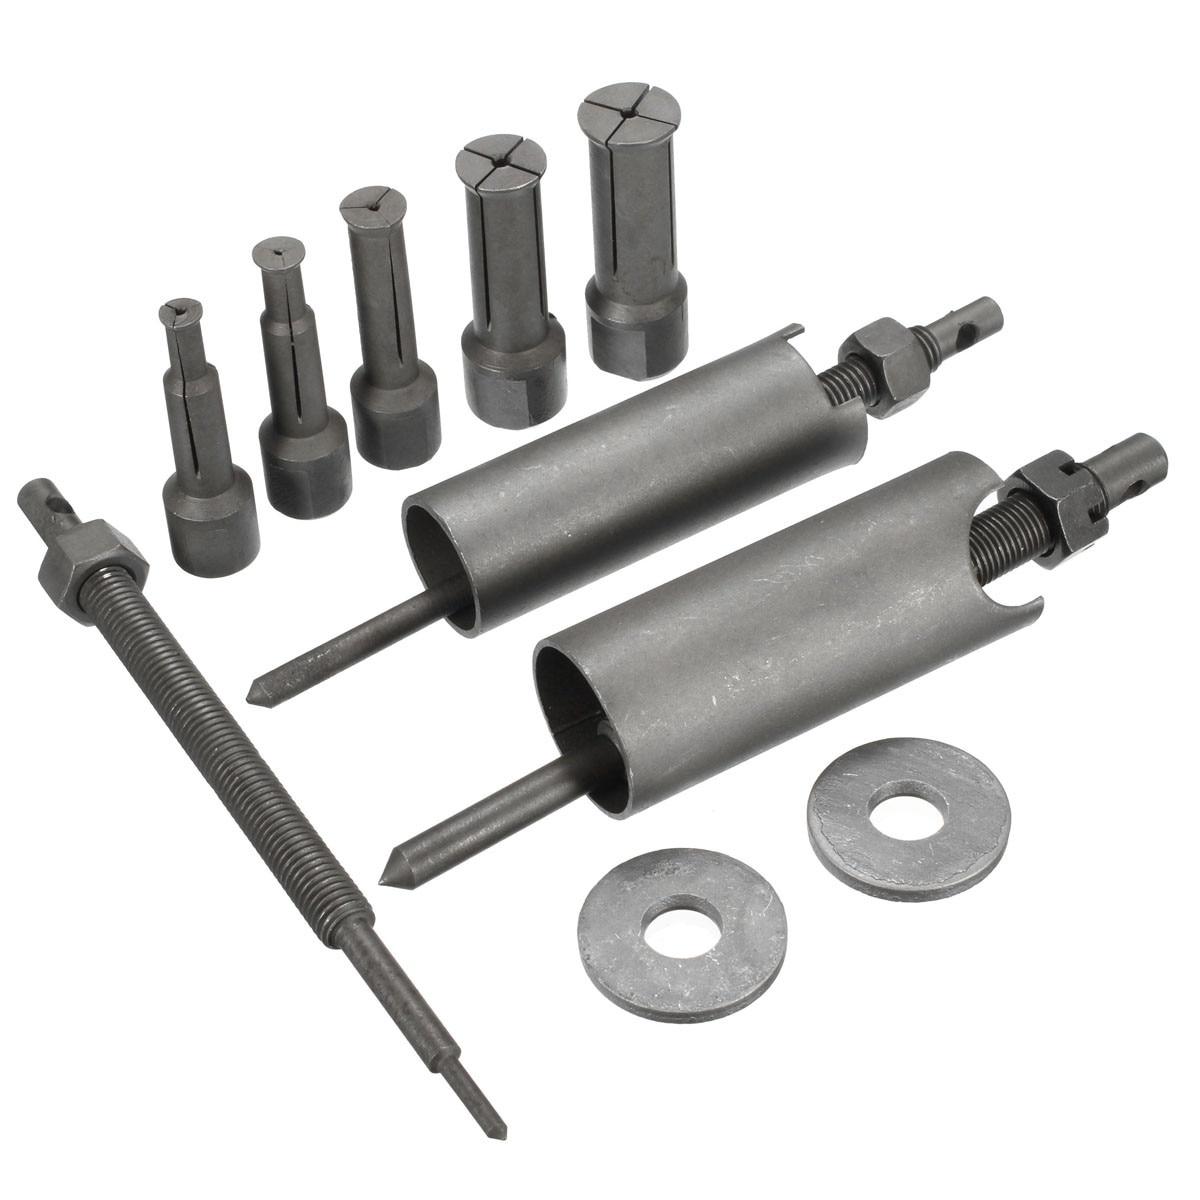 Bearing Puller For Bikes : Bike suspension bearing puller the best of